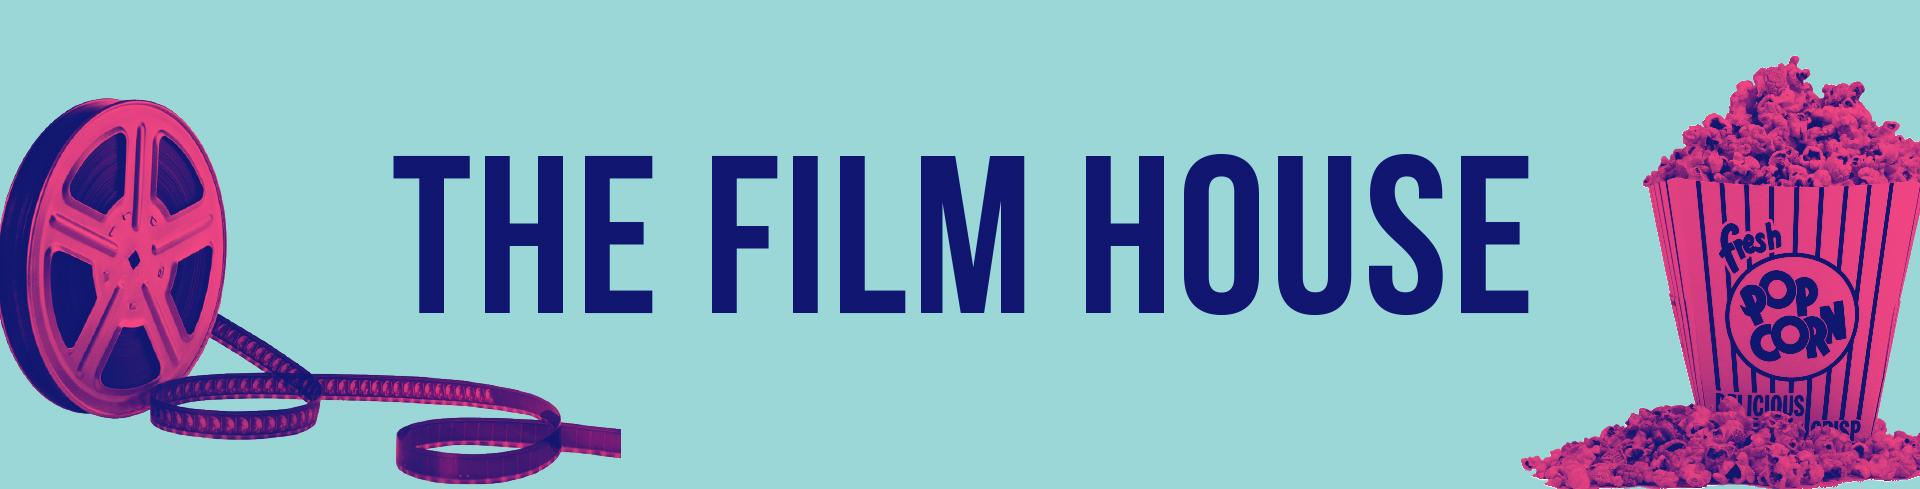 Catch the hottest Oscar buzz-worthy films @ The Film House!